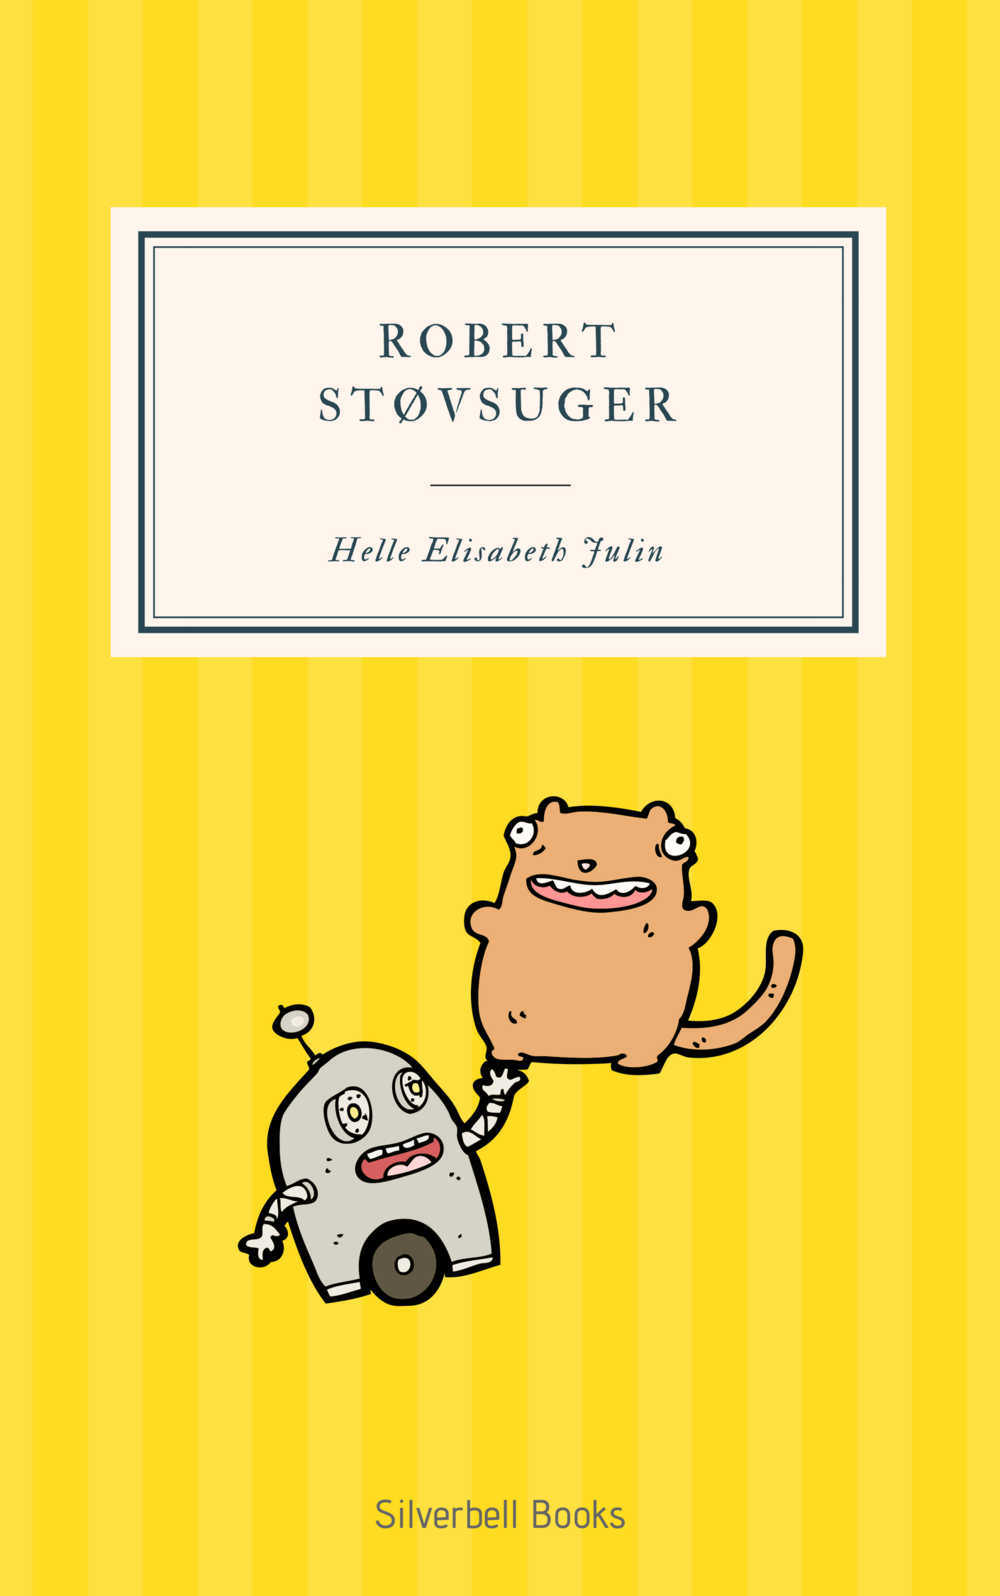 Ny Robert Støvsuger e-bog